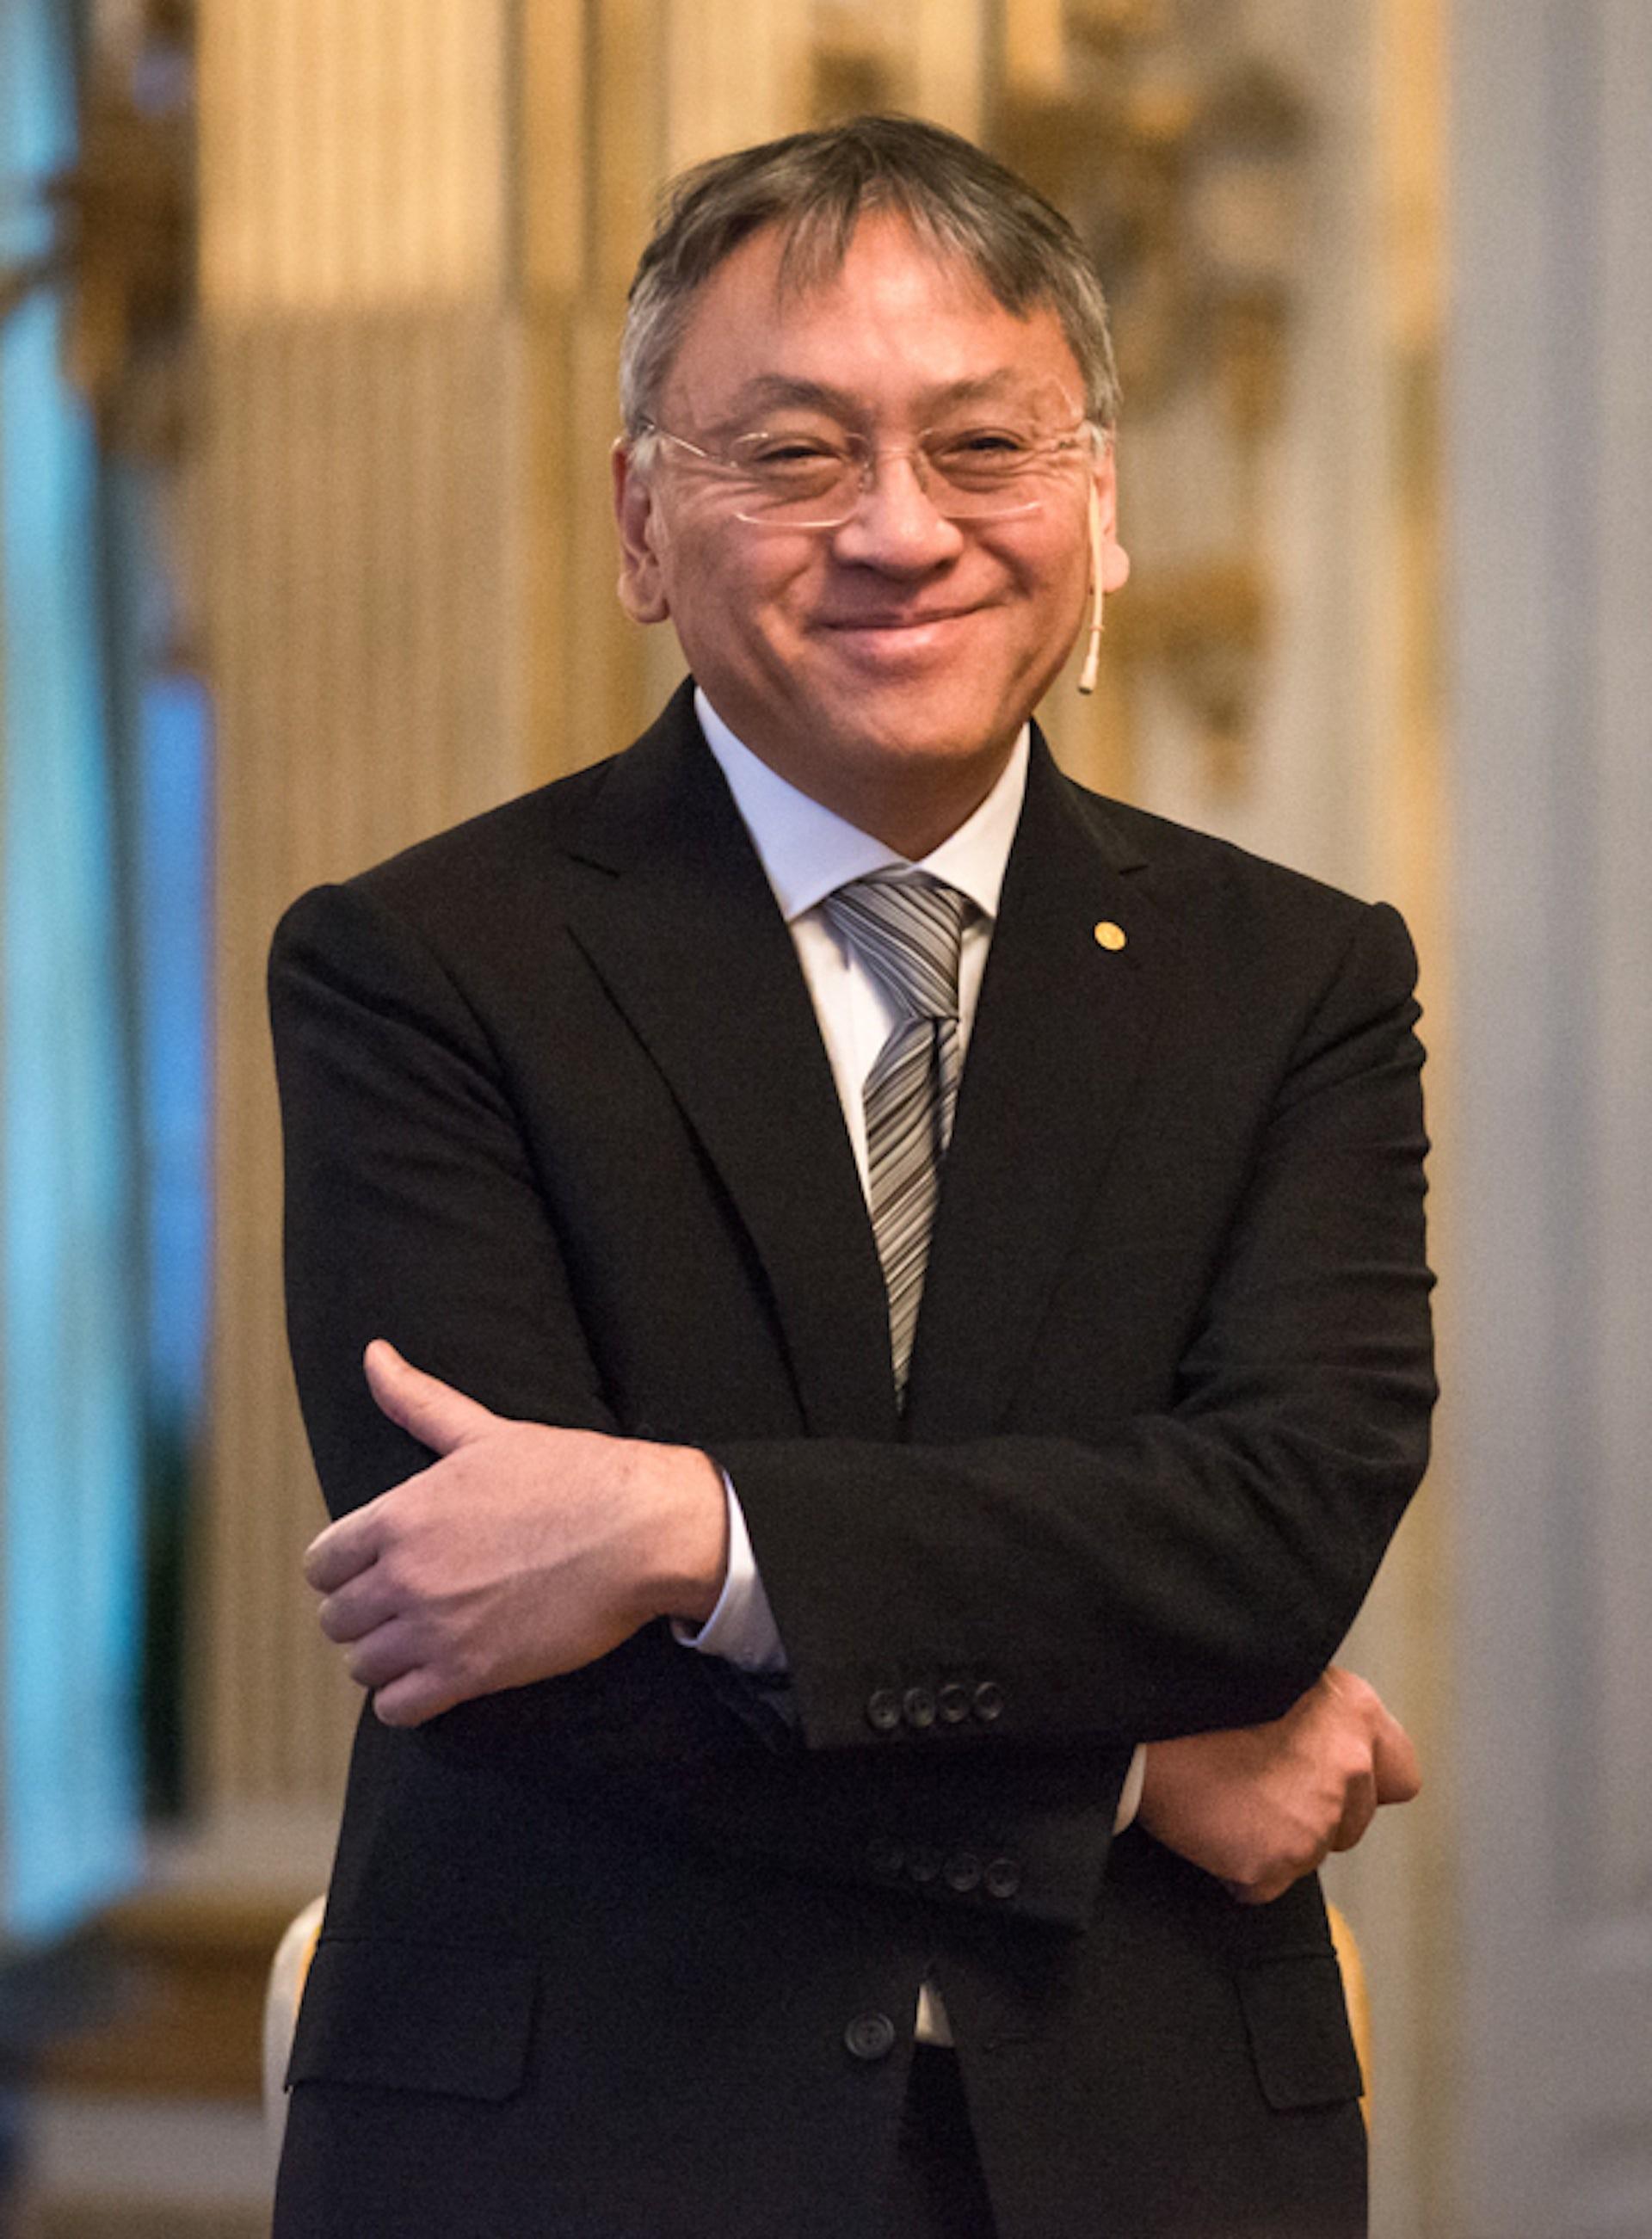 Kazuo Ishiguro. Photo credit: Wikimedia Commons